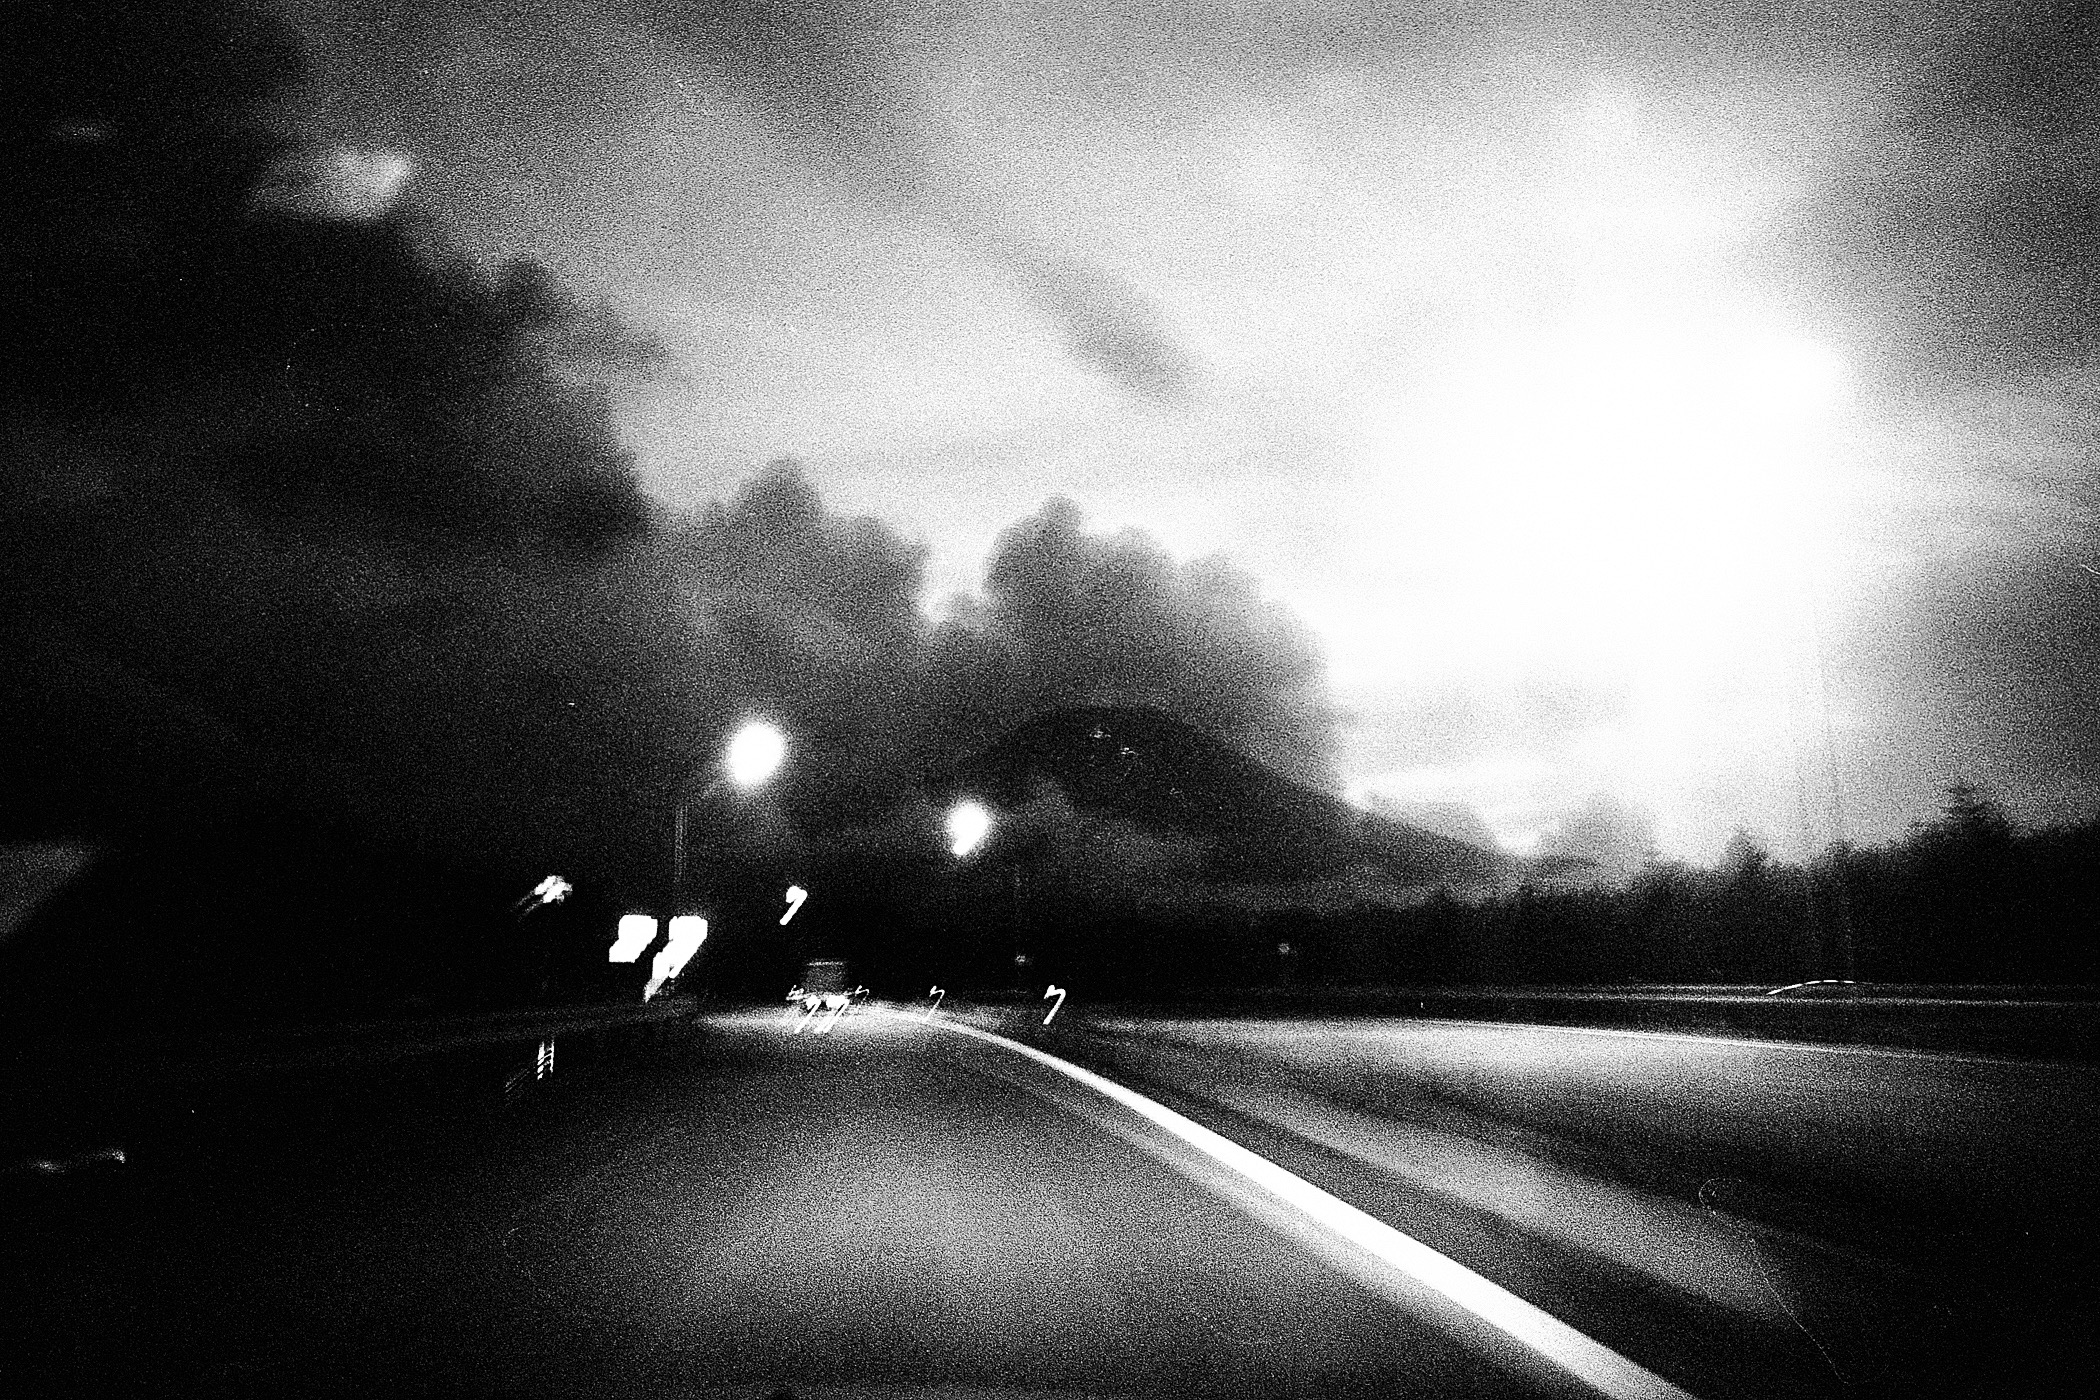 Cameron Kline |Fuji After Dark |Ricoh GRV